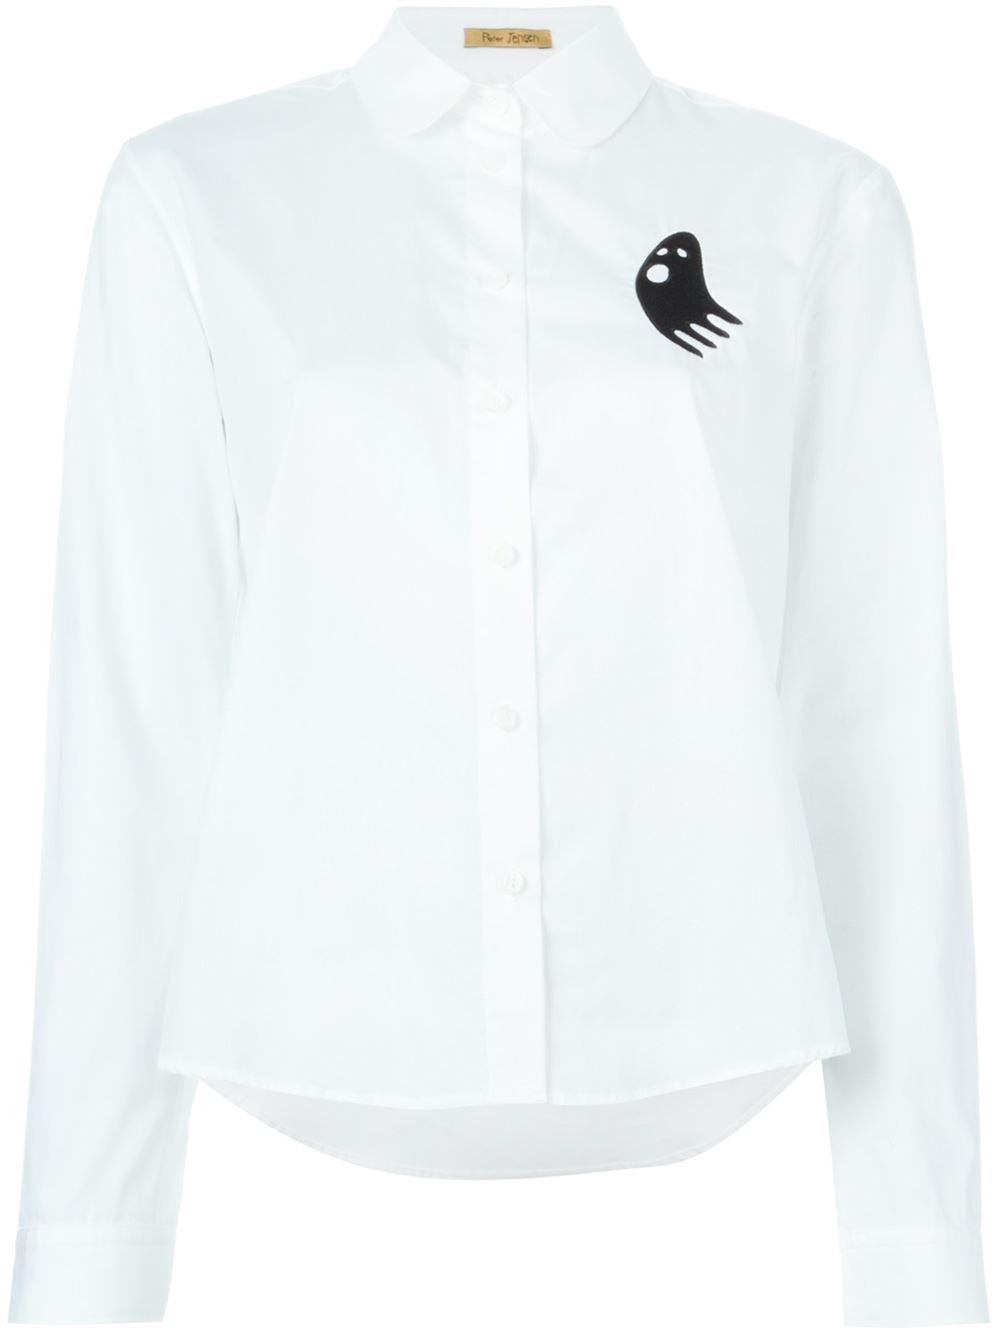 Peter jensen classic shirt with a peter pan collar in for White cotton shirt peter pan collar